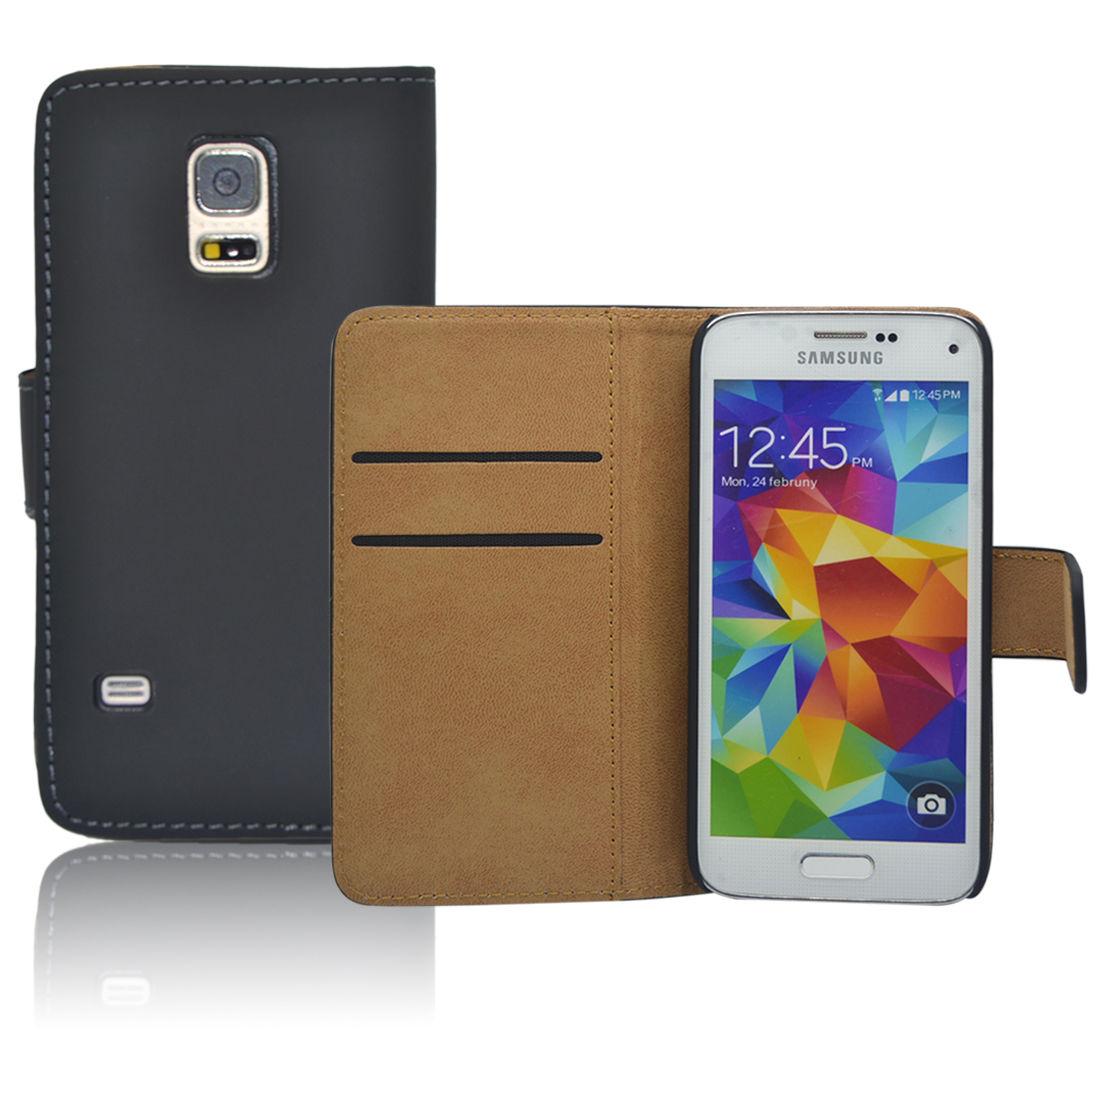 Pouzdro pro Samsung Galaxy S5 mini G800 černé